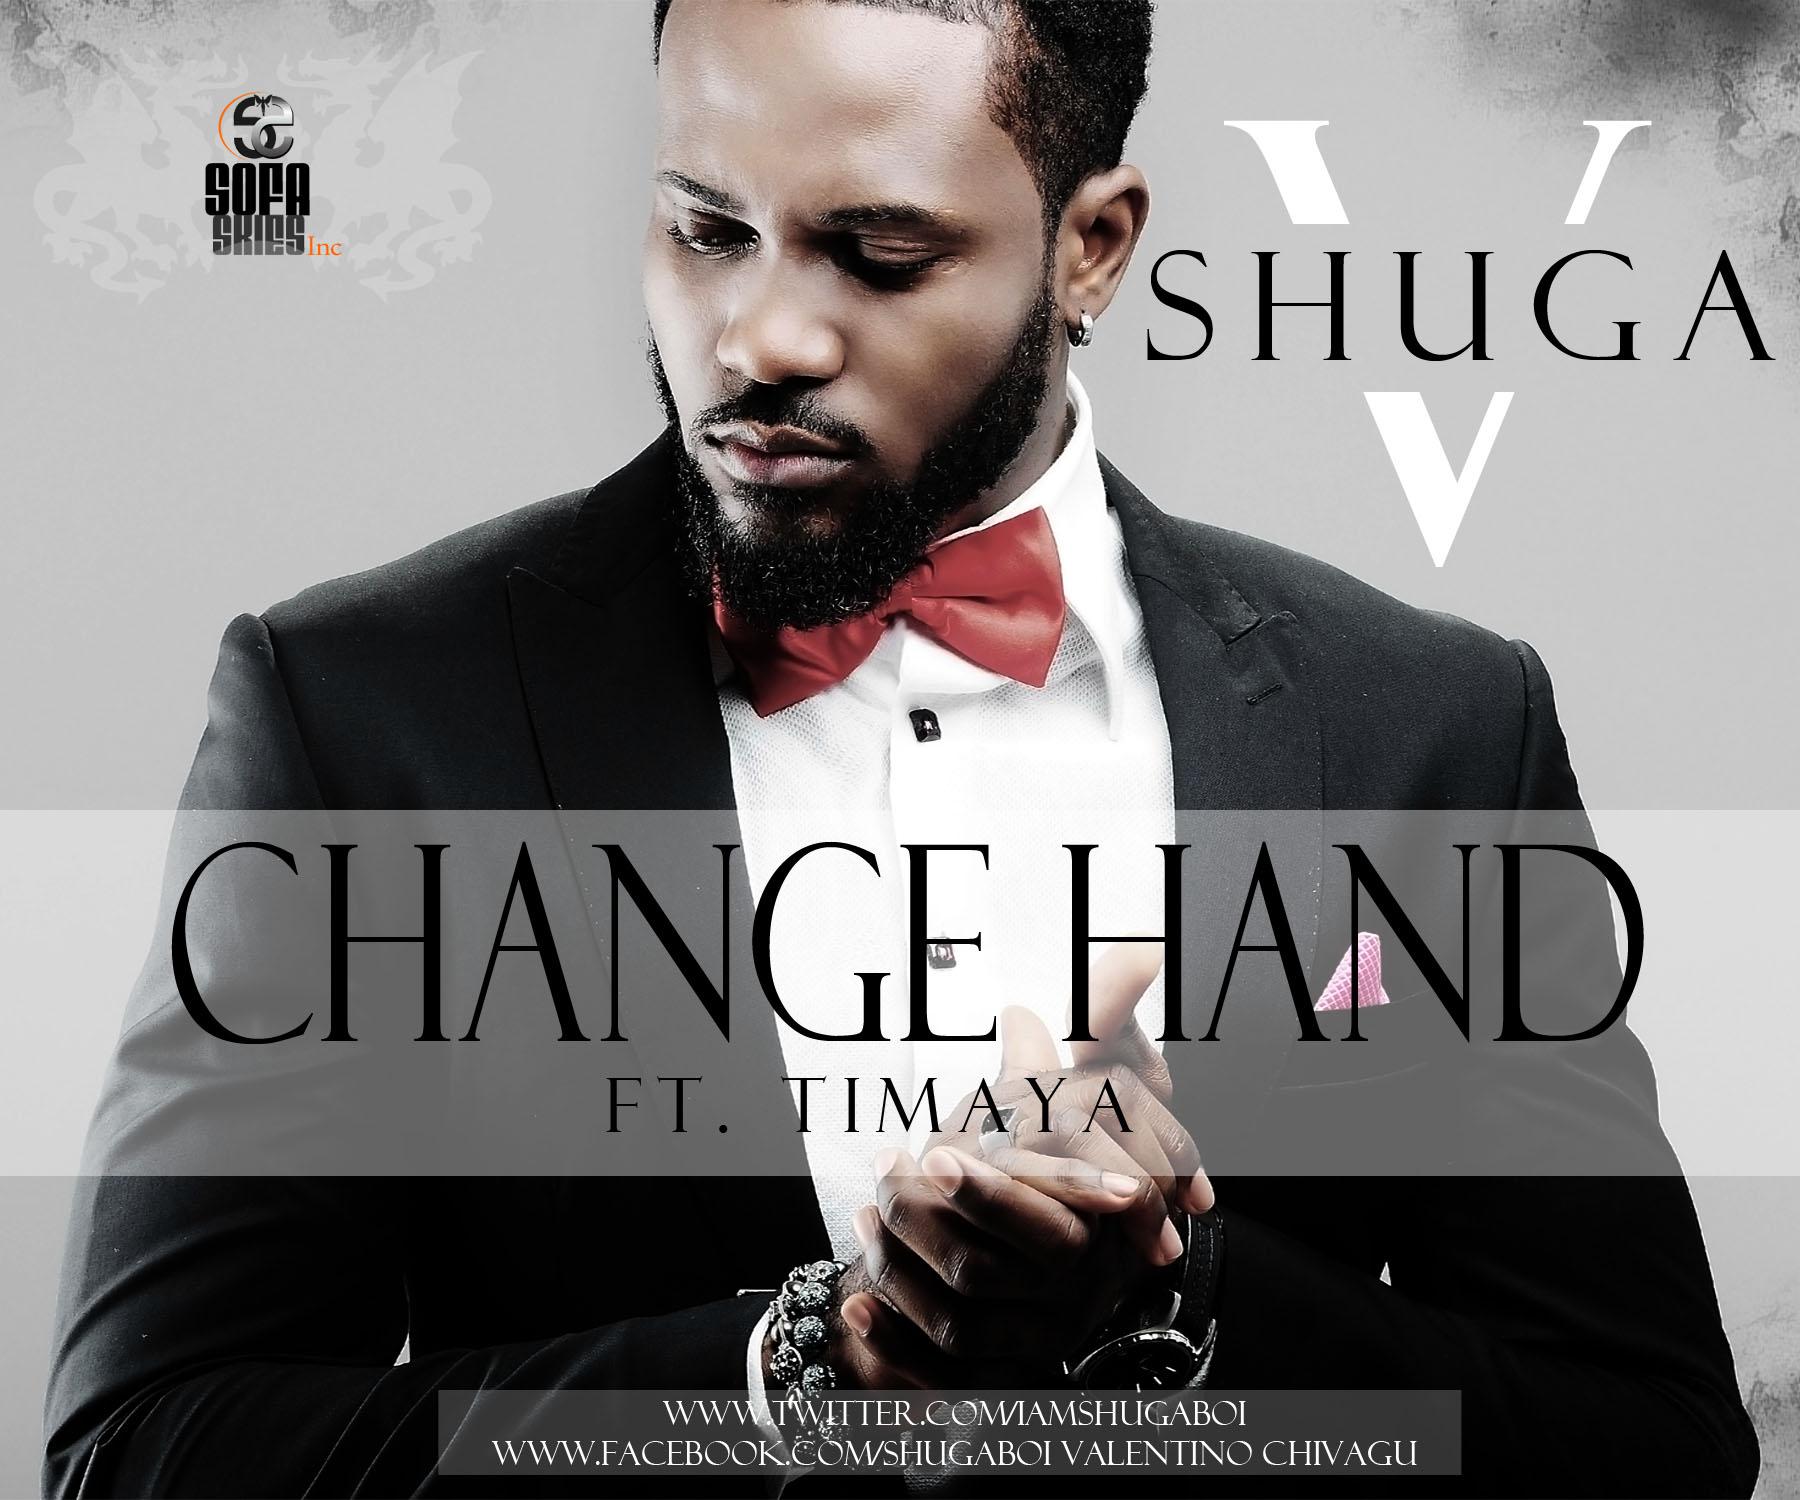 Shuga V ft. Timaya - CHANGE HAND [prod. by Phyno] Artwork   AceWorldTeam.com